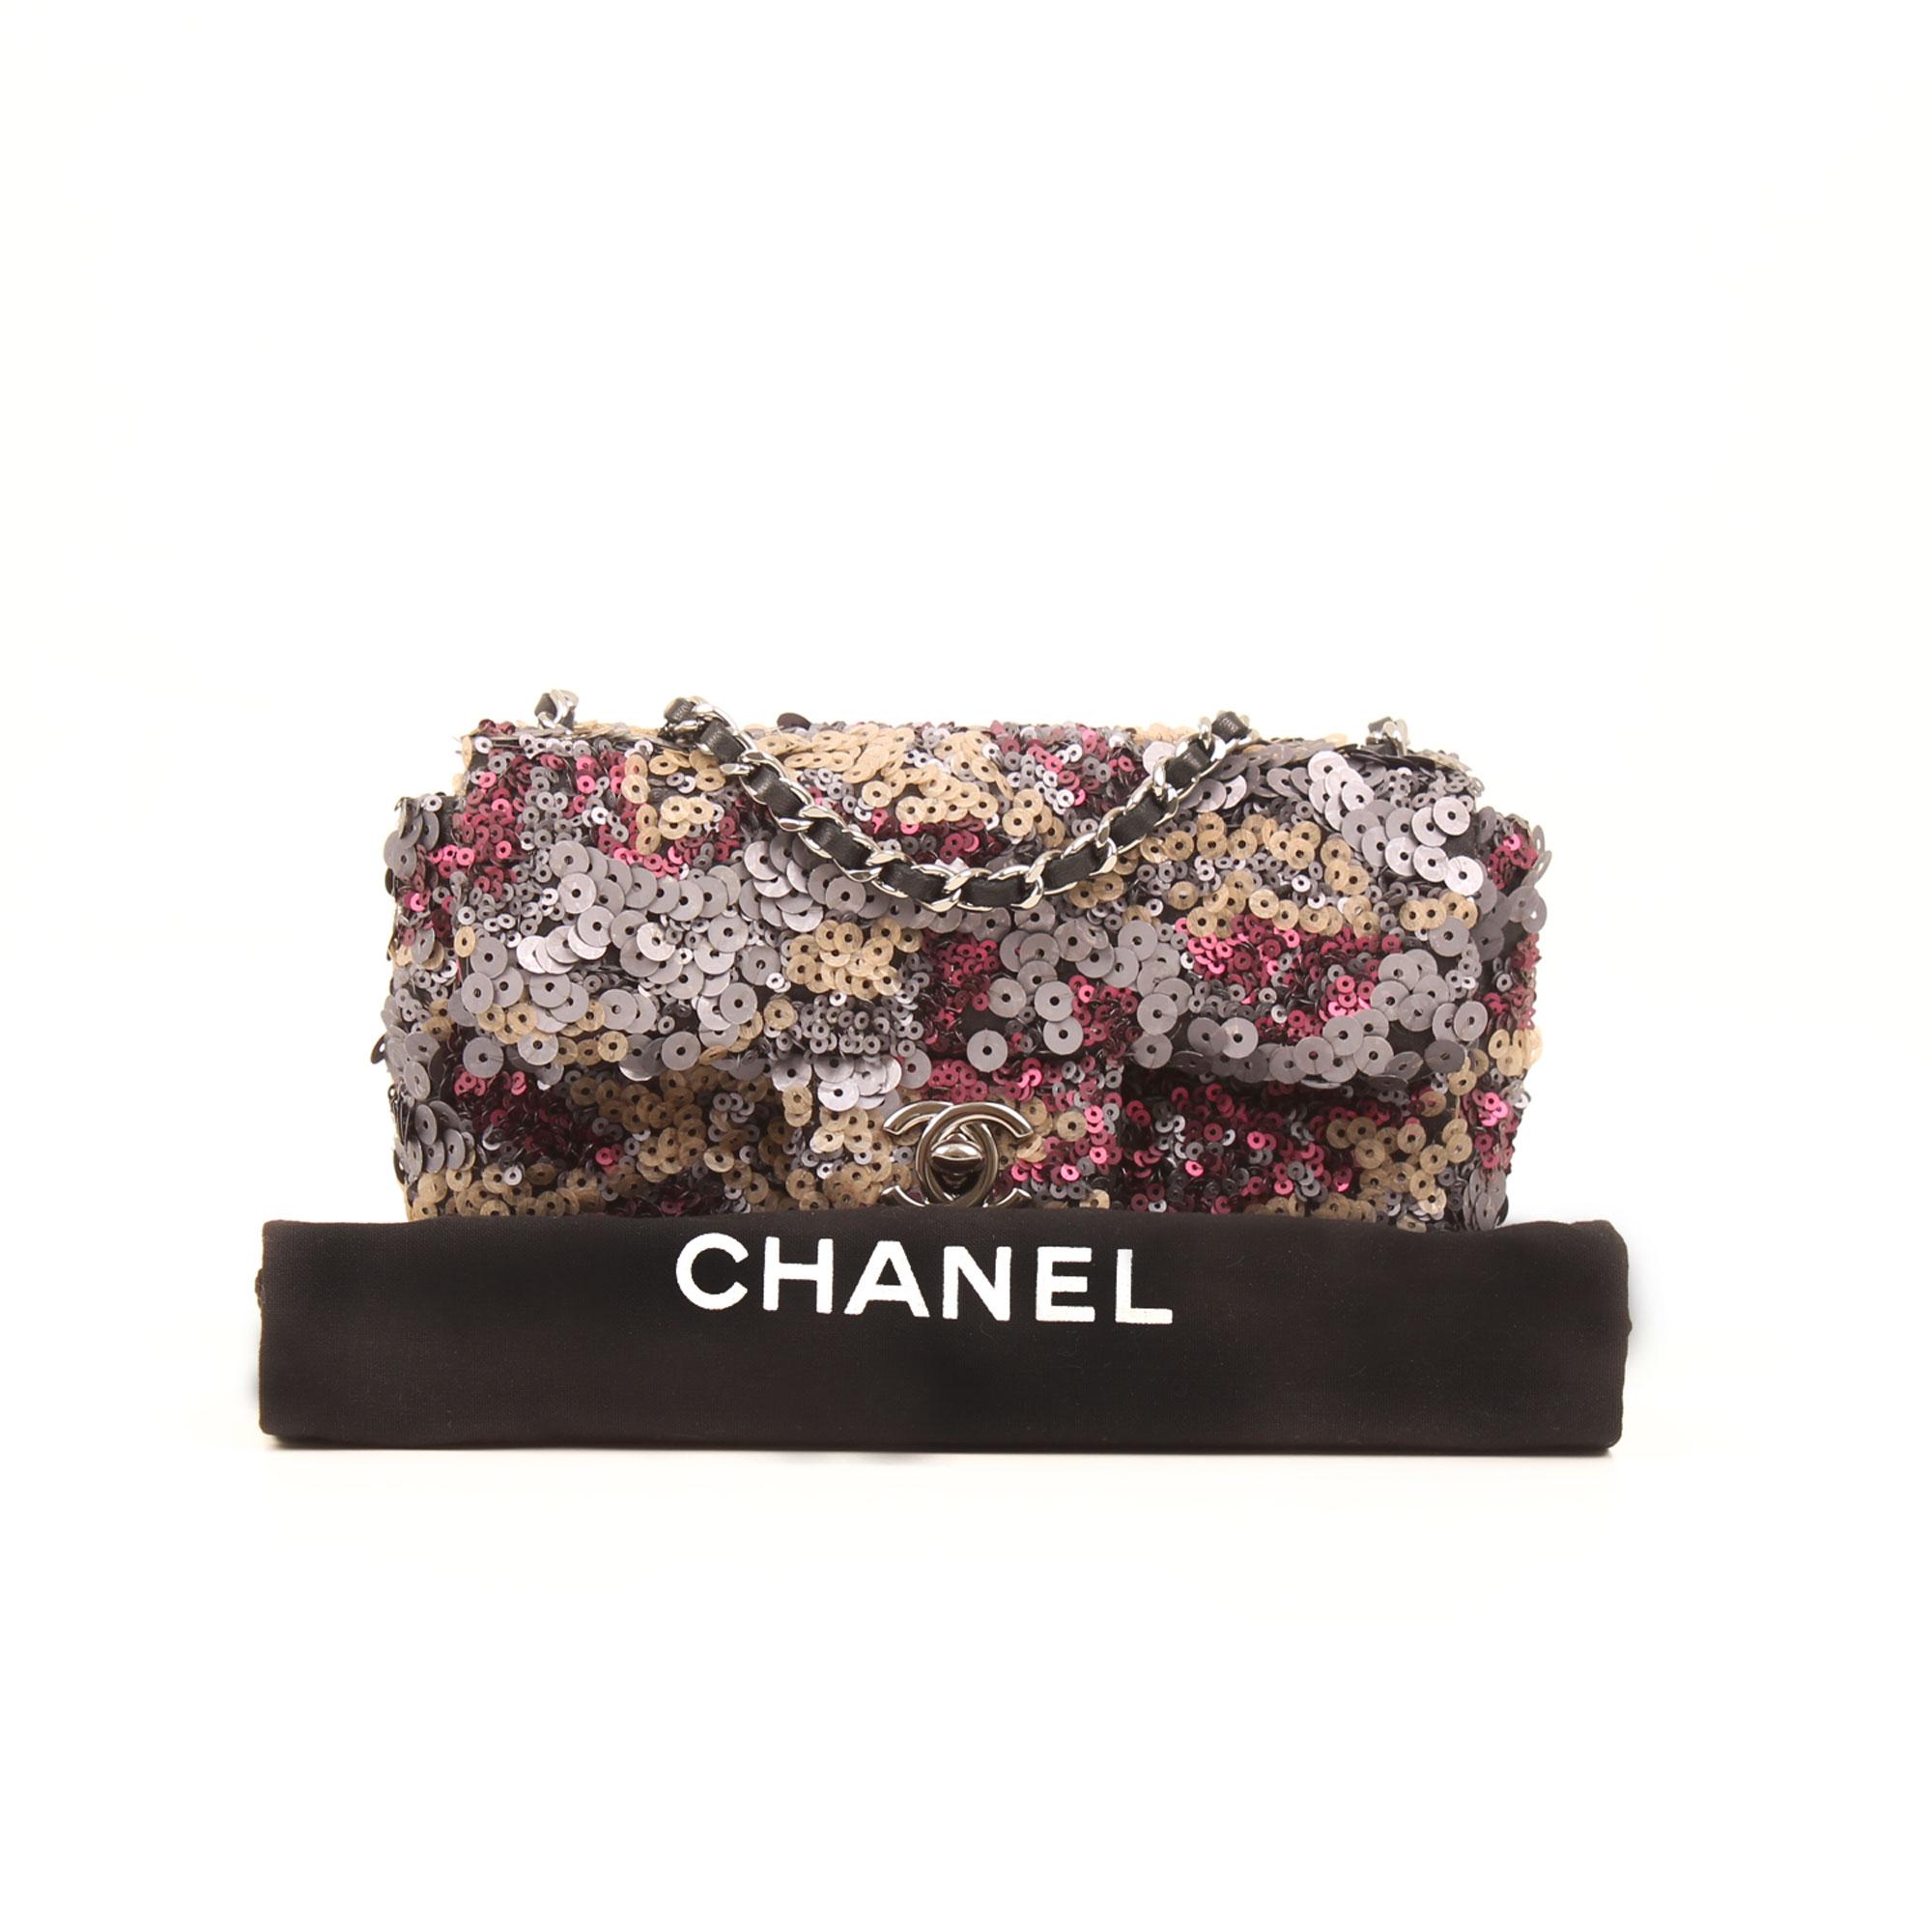 Imagen del dustbag del bolso chanel mini classic flap lentejuelas multicolor